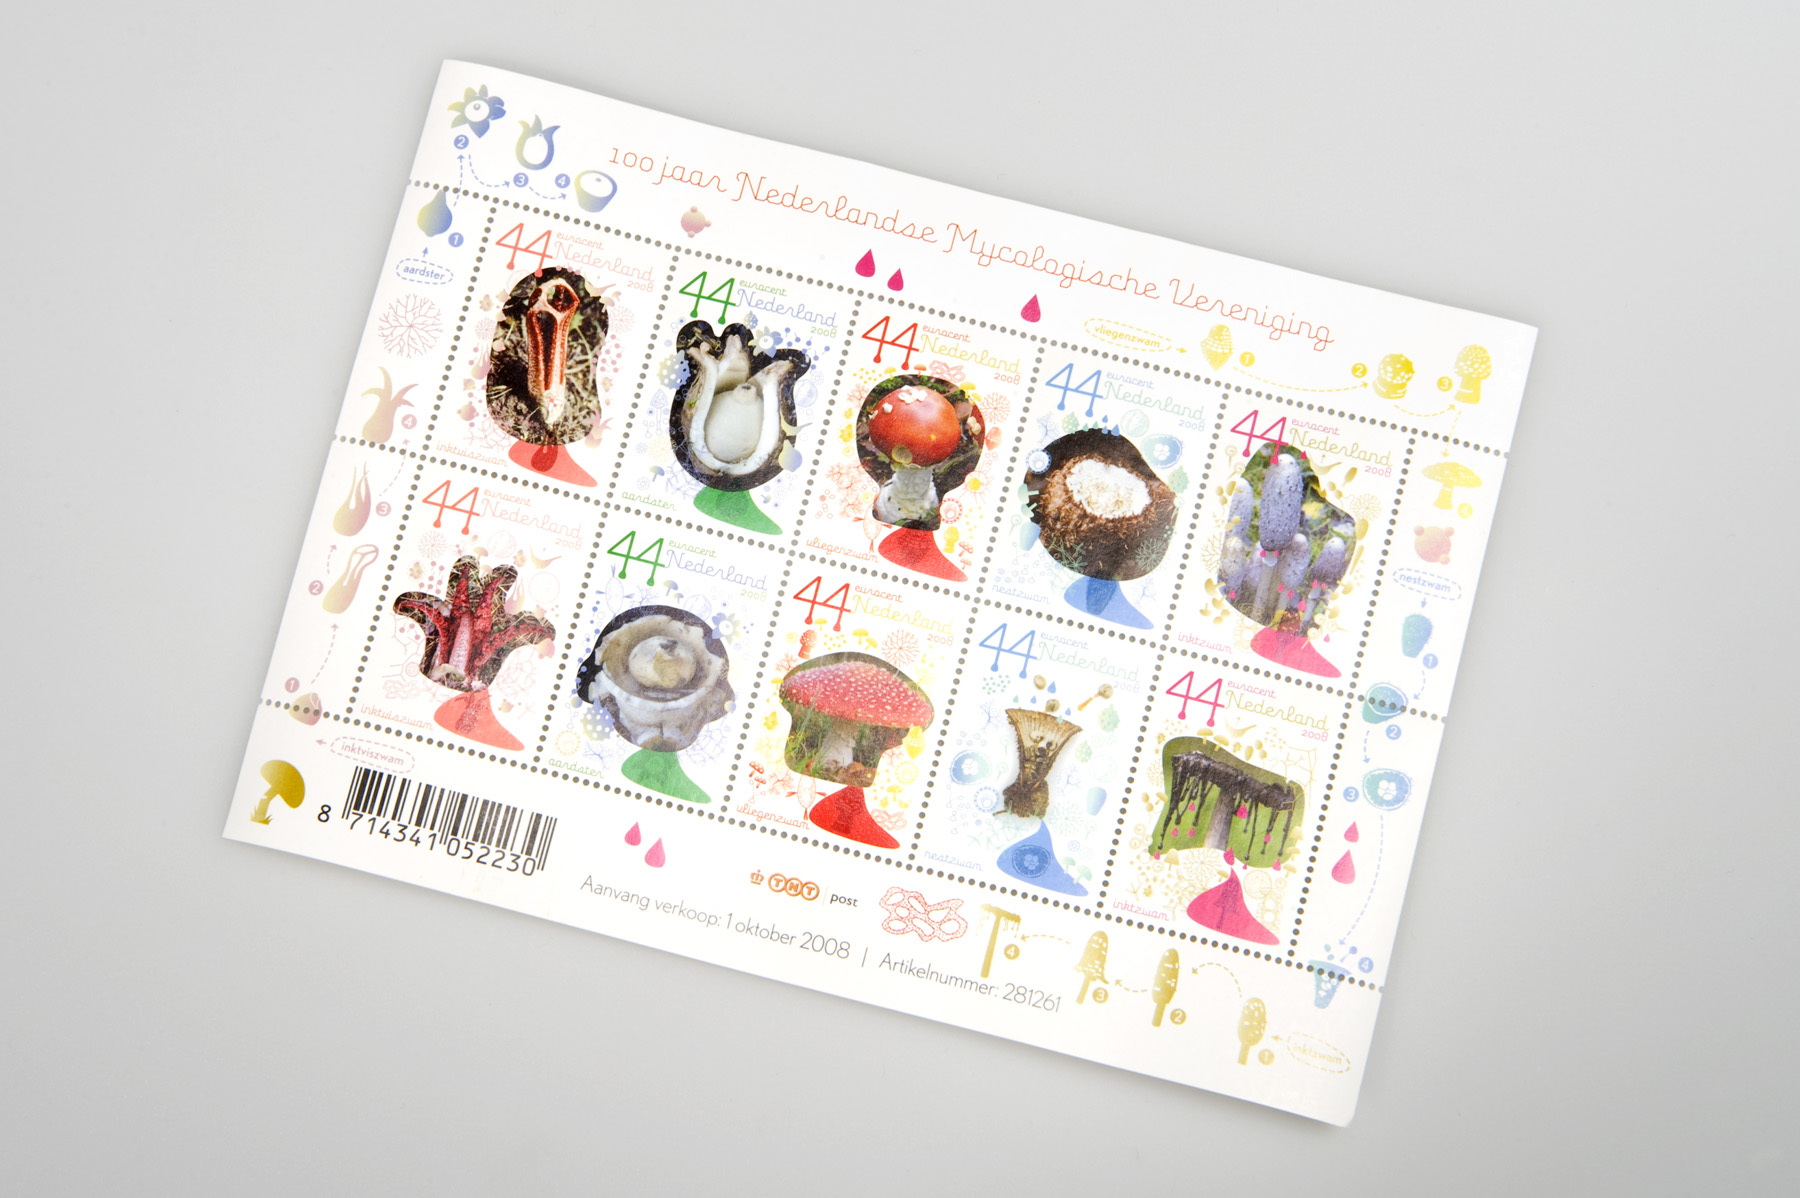 Postzegels paddestoelen / Mythological Stamps Post NL.jpg